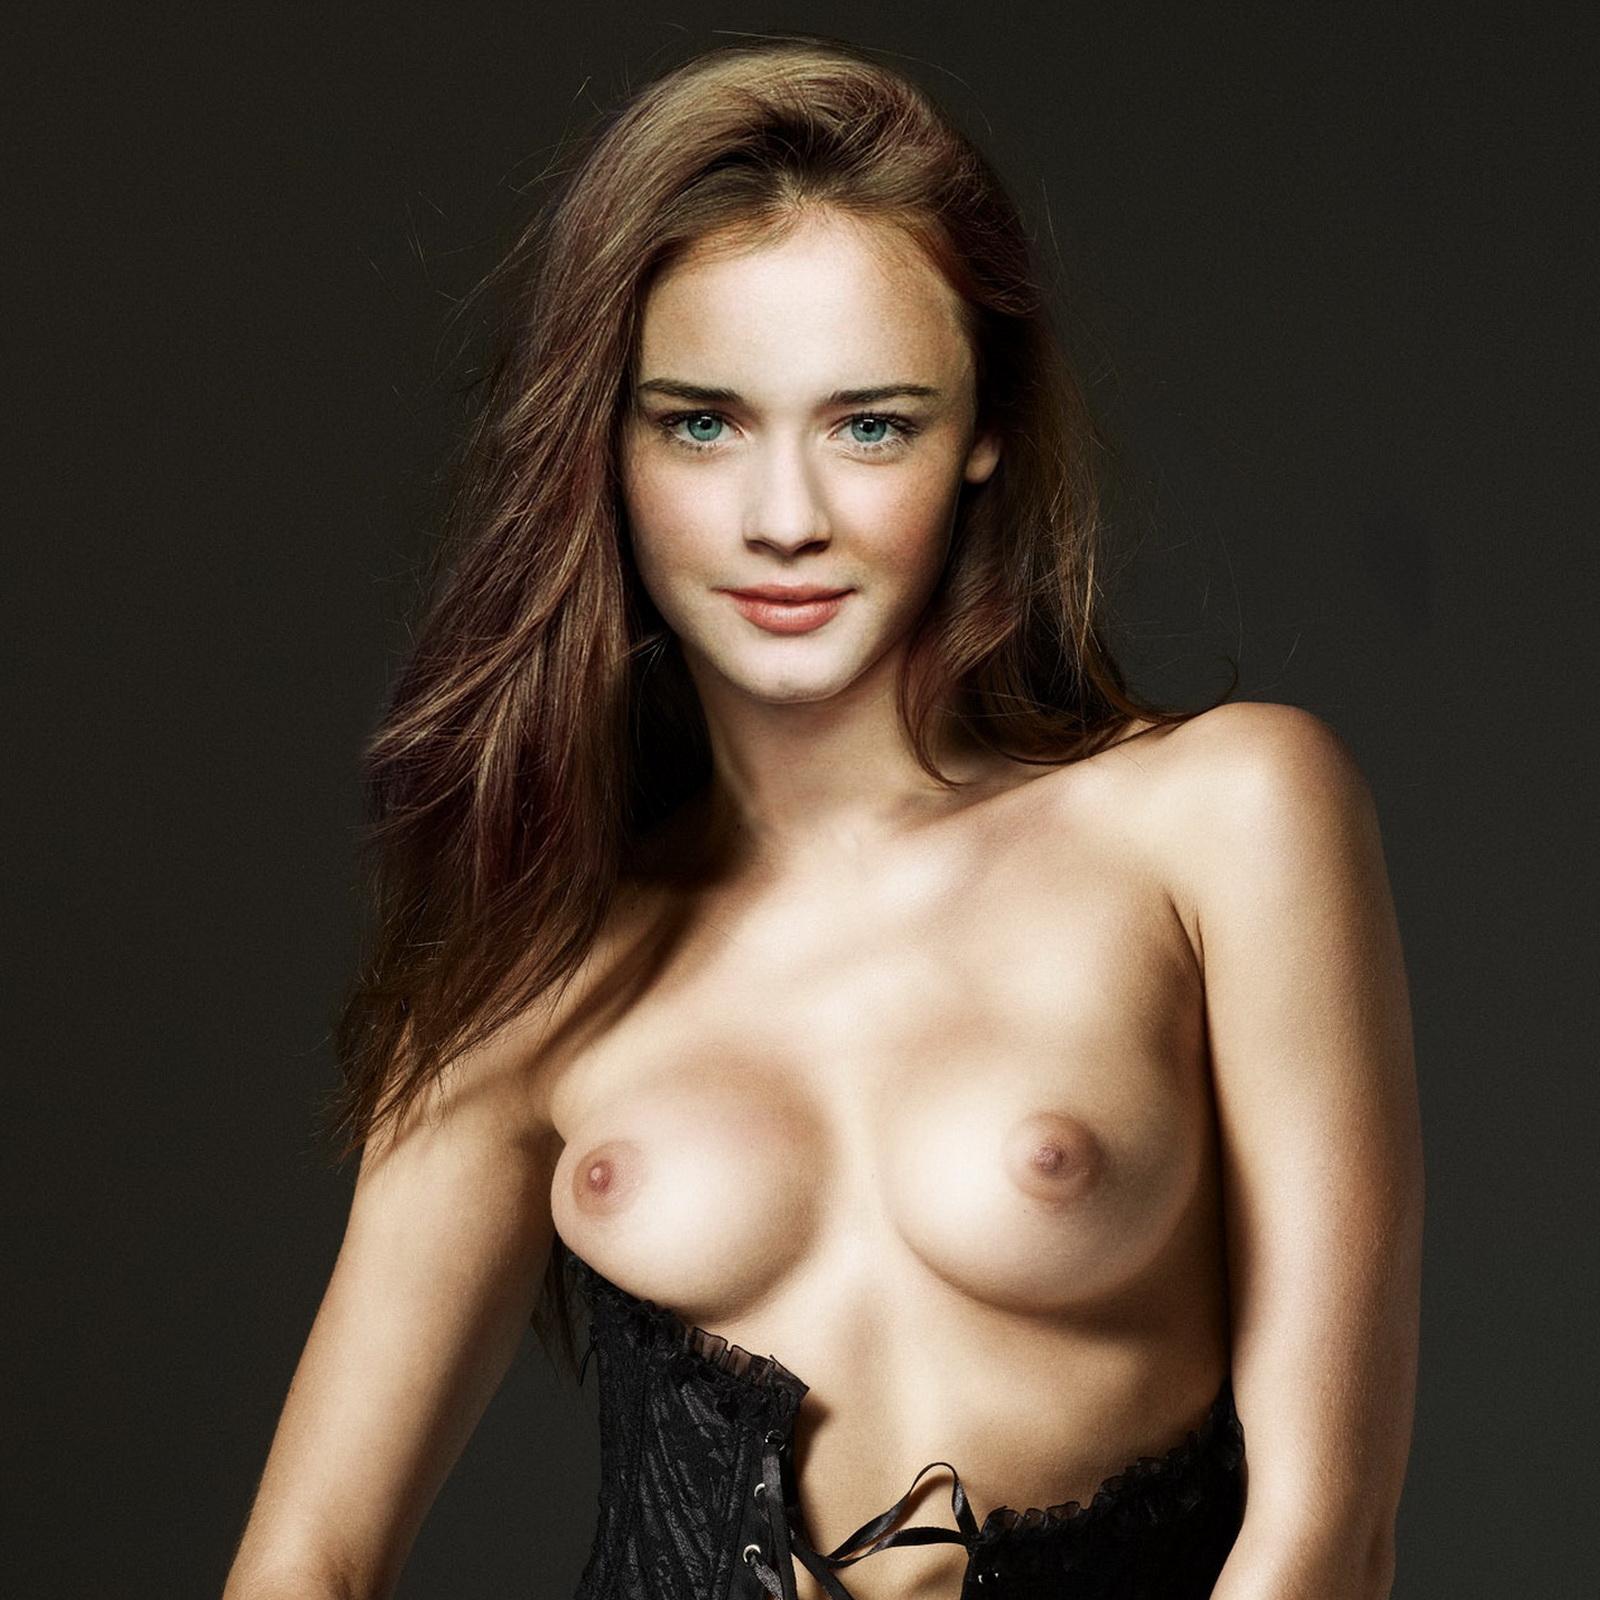 Alexis bledel gilmore girls nude